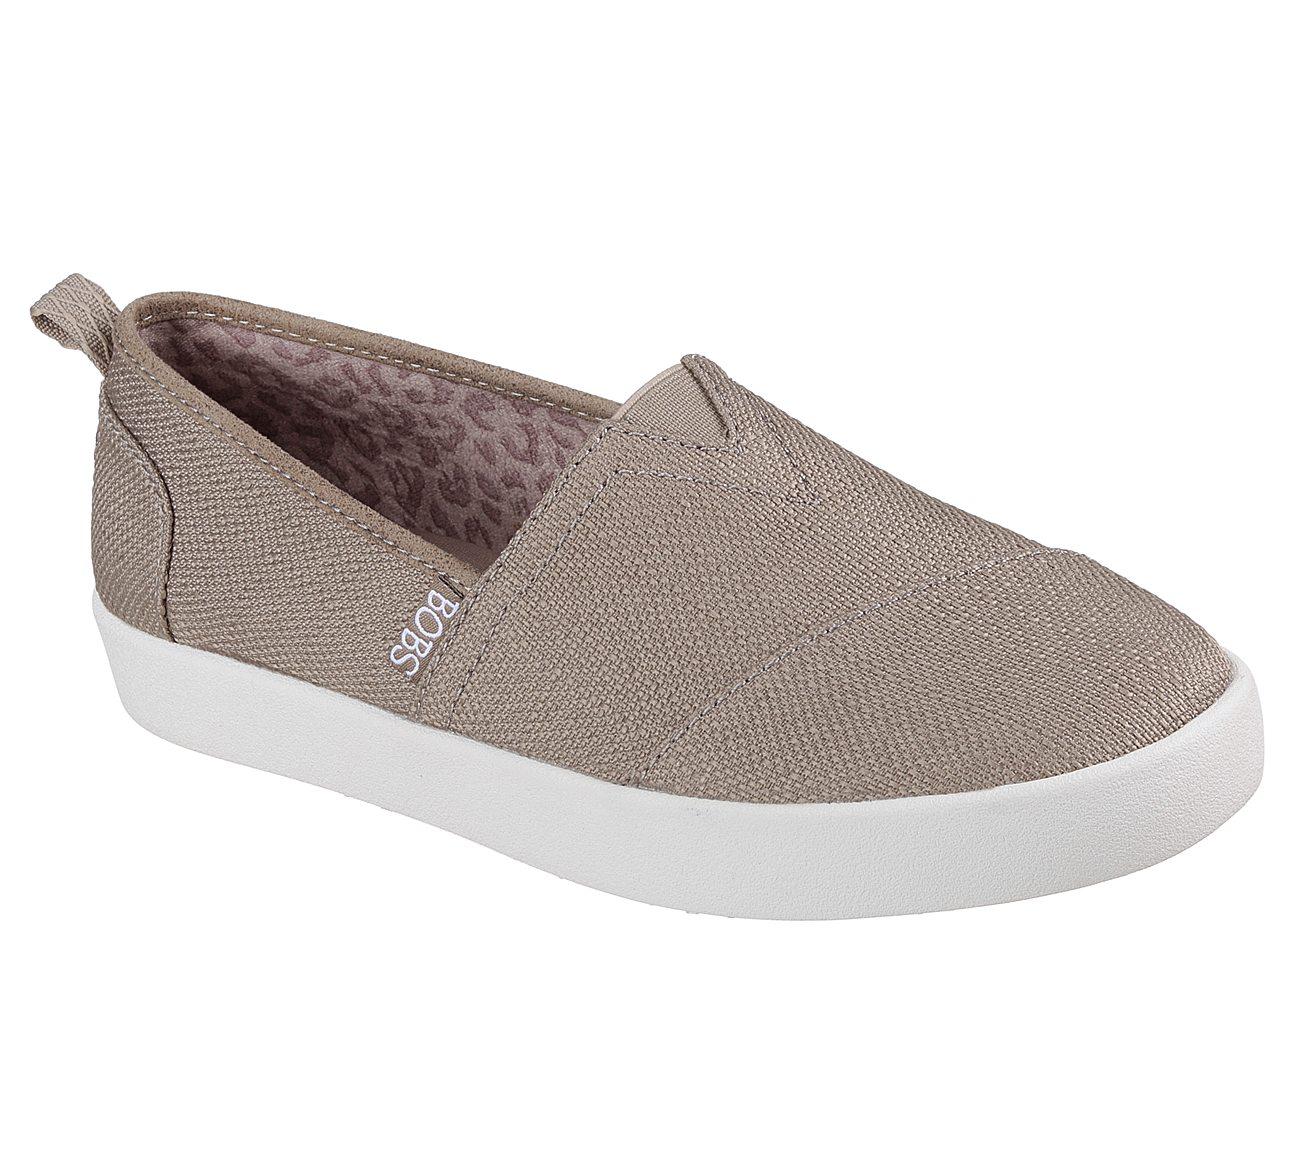 Buy SKECHERS BOBS B-Loved BOBS Shoes